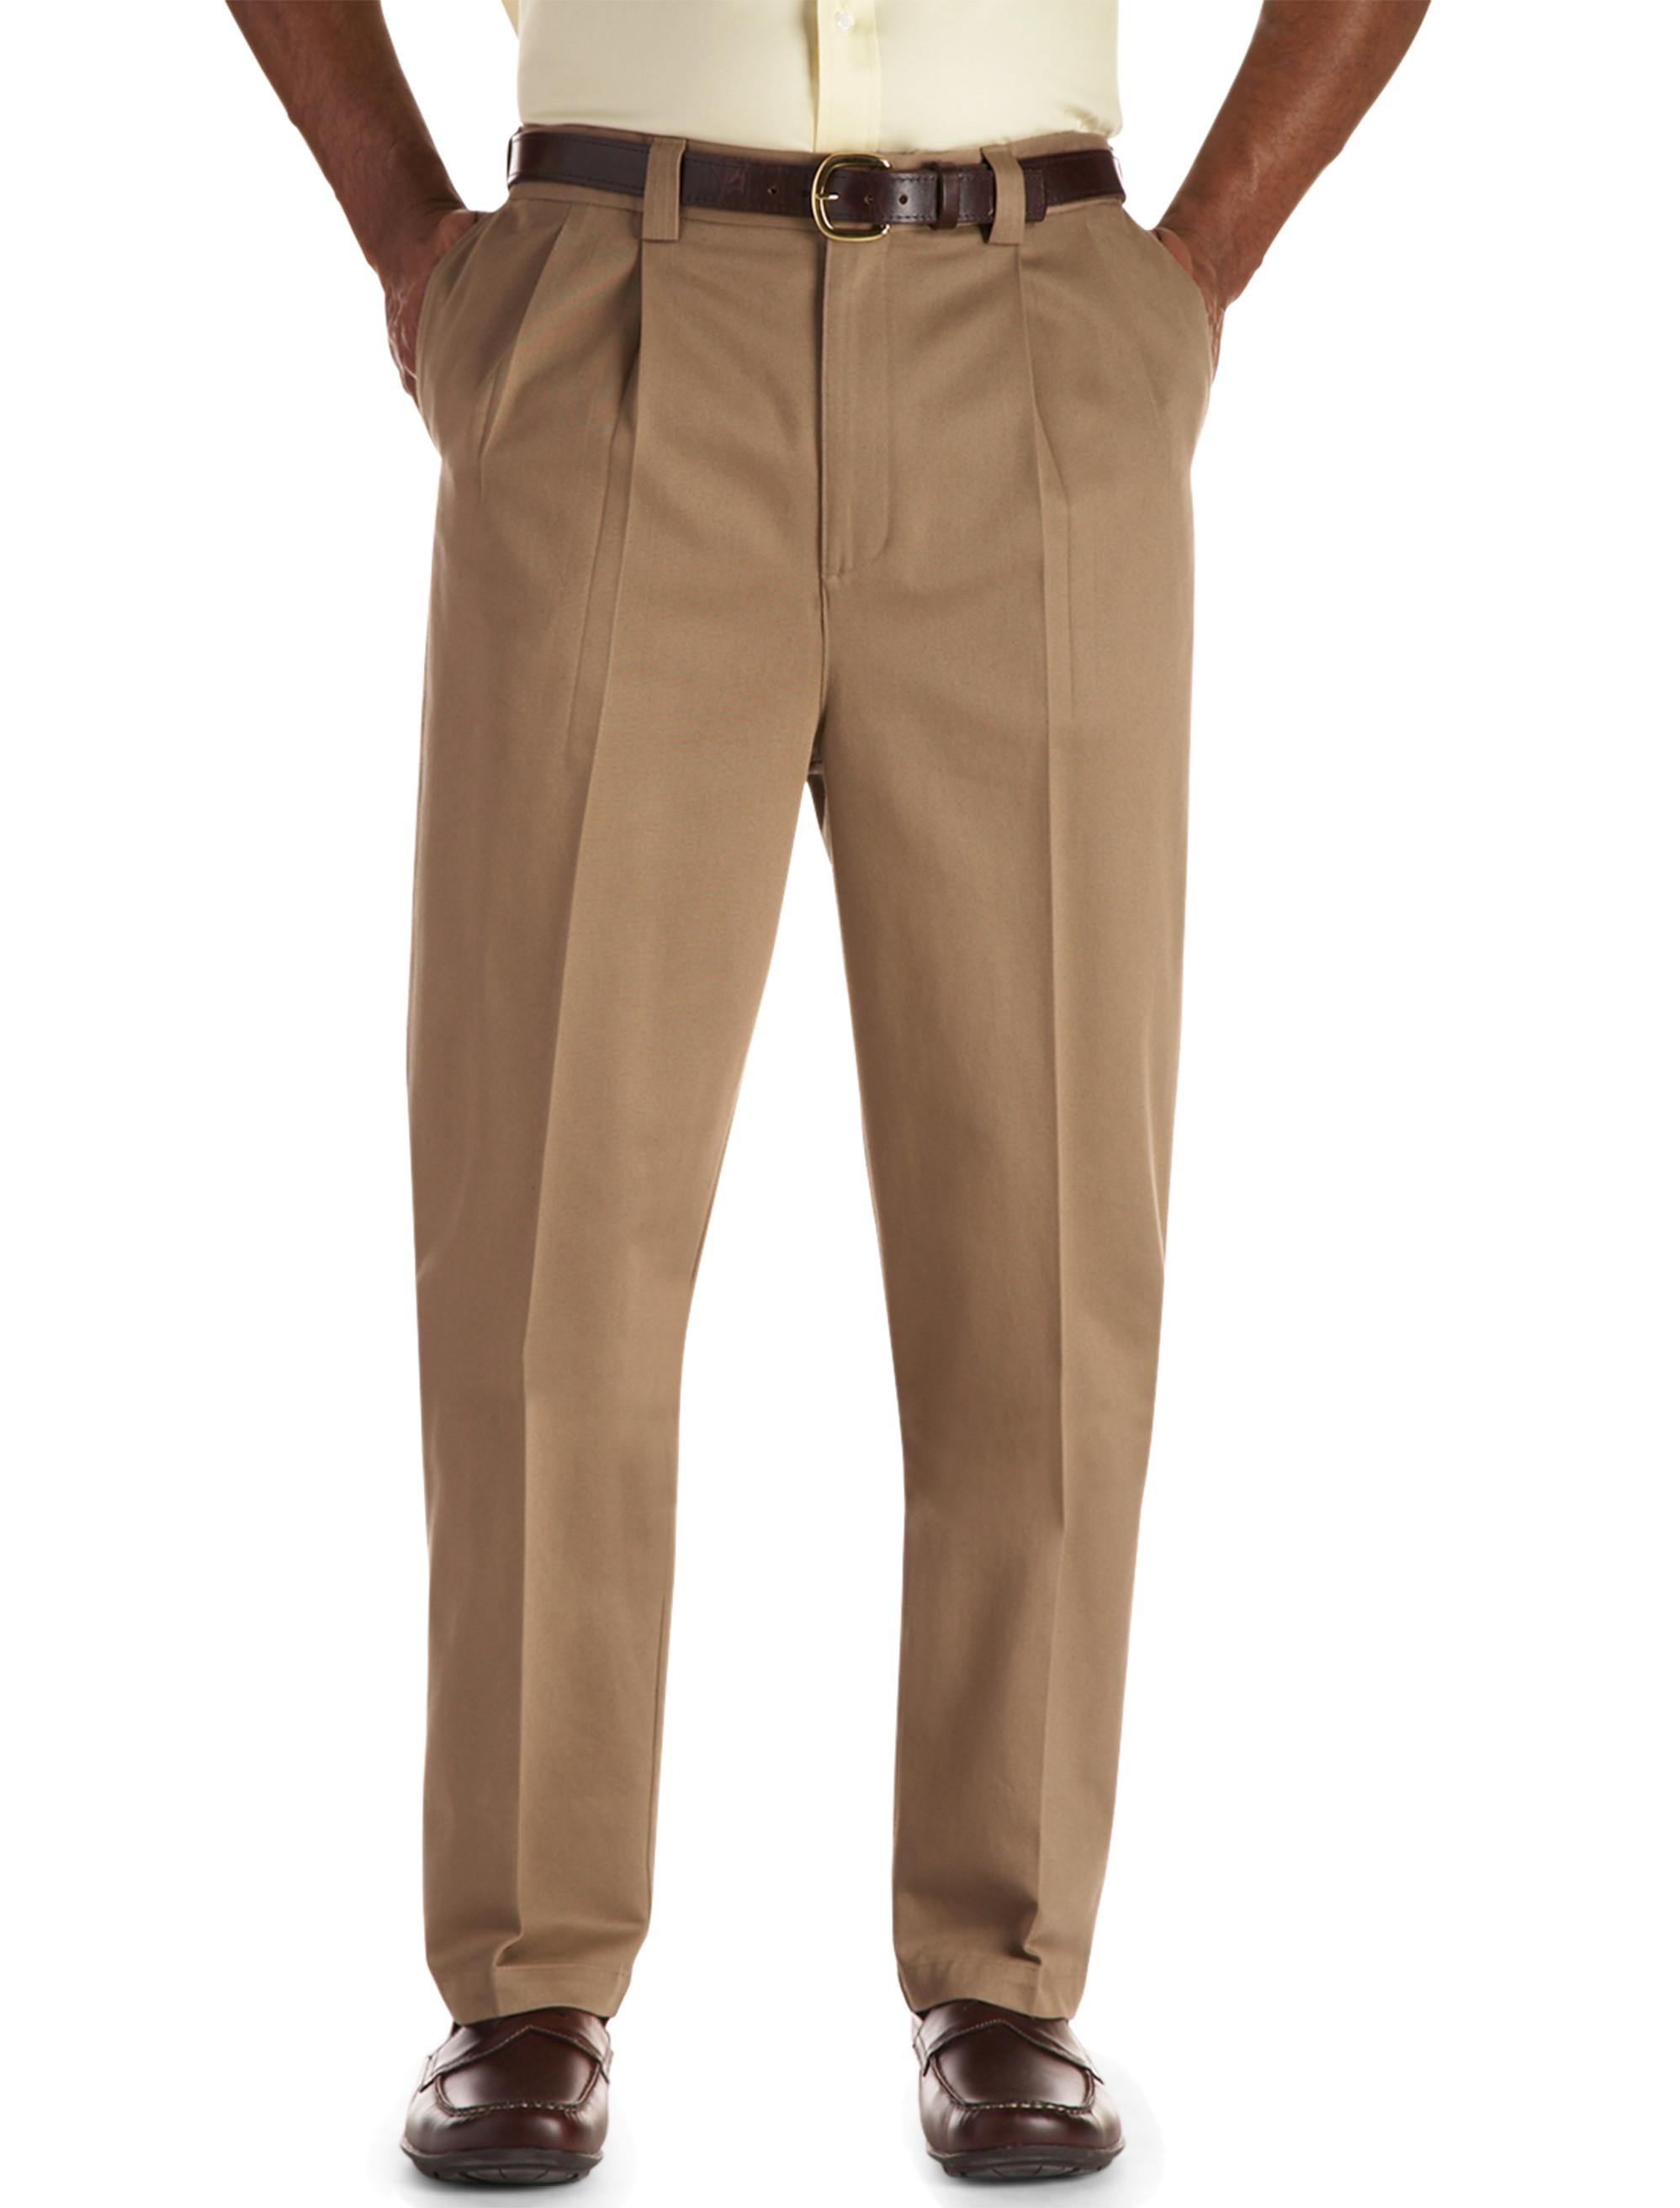 Oak Hill Waist-Relaxer Pleated Premium Pants Casual Male XL